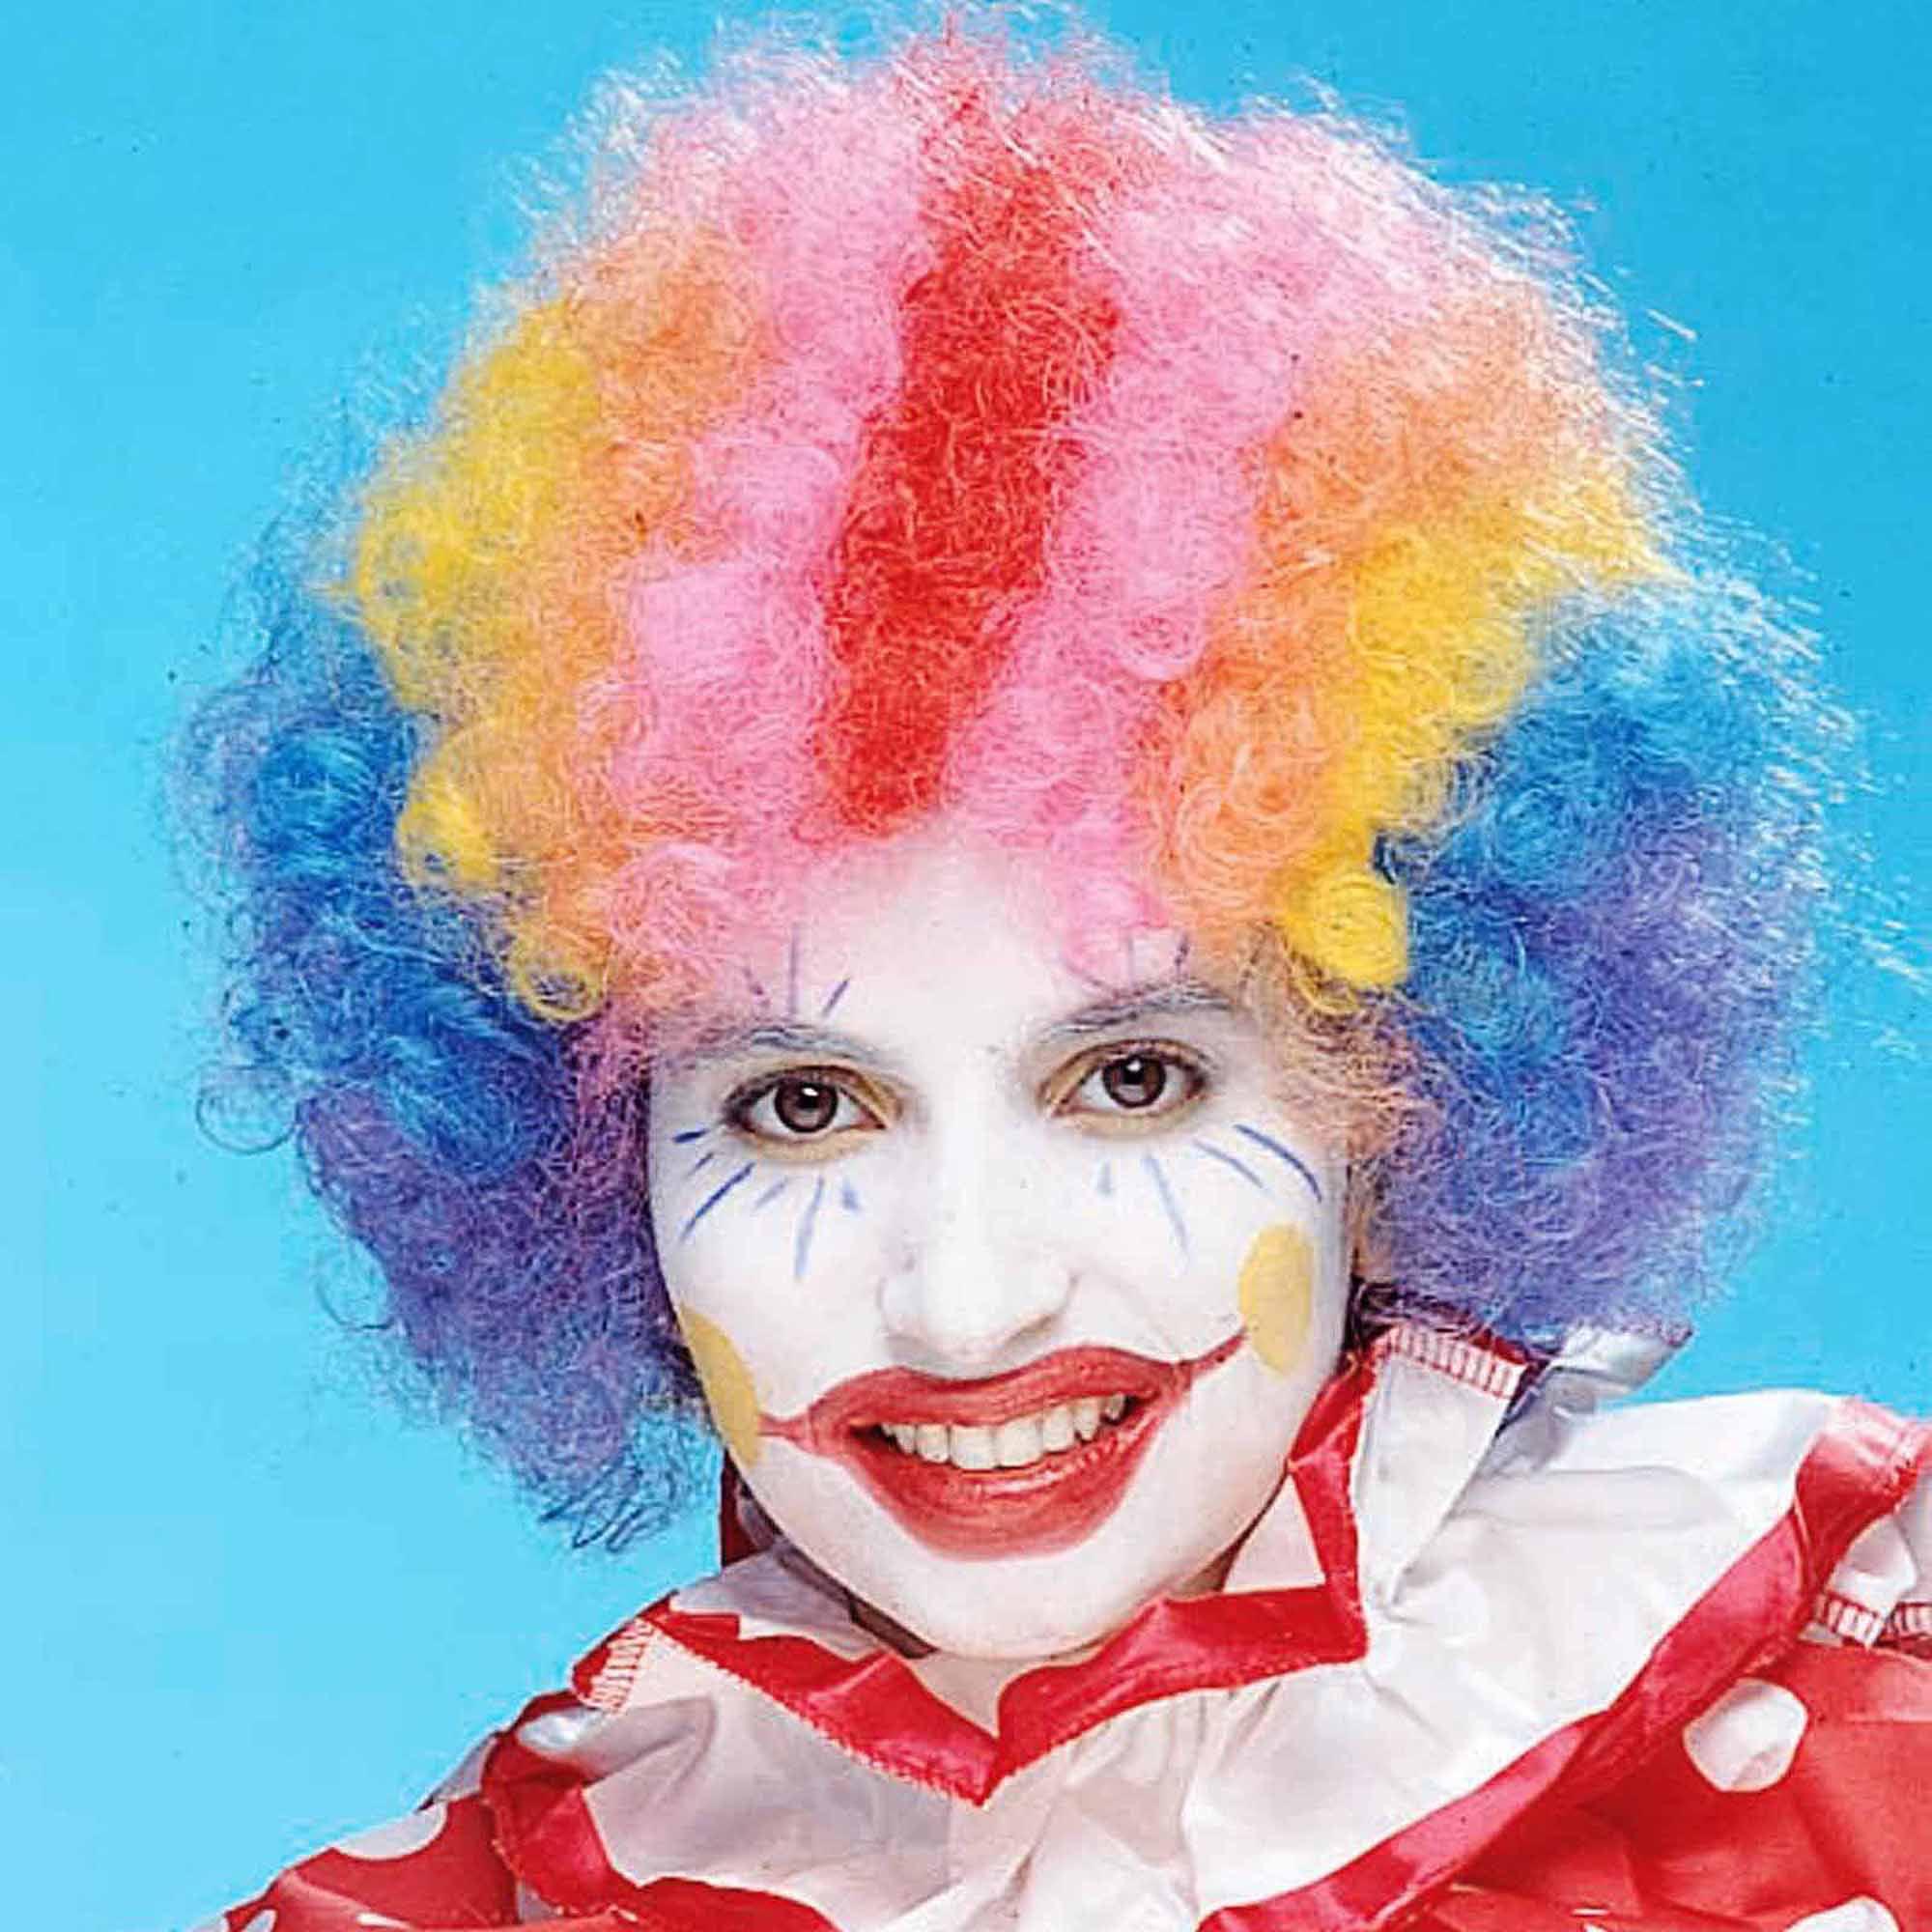 Rainbow Economy Clown Wig Adult Halloween Costume Accessory - Walmart.com 0e09b2fb5